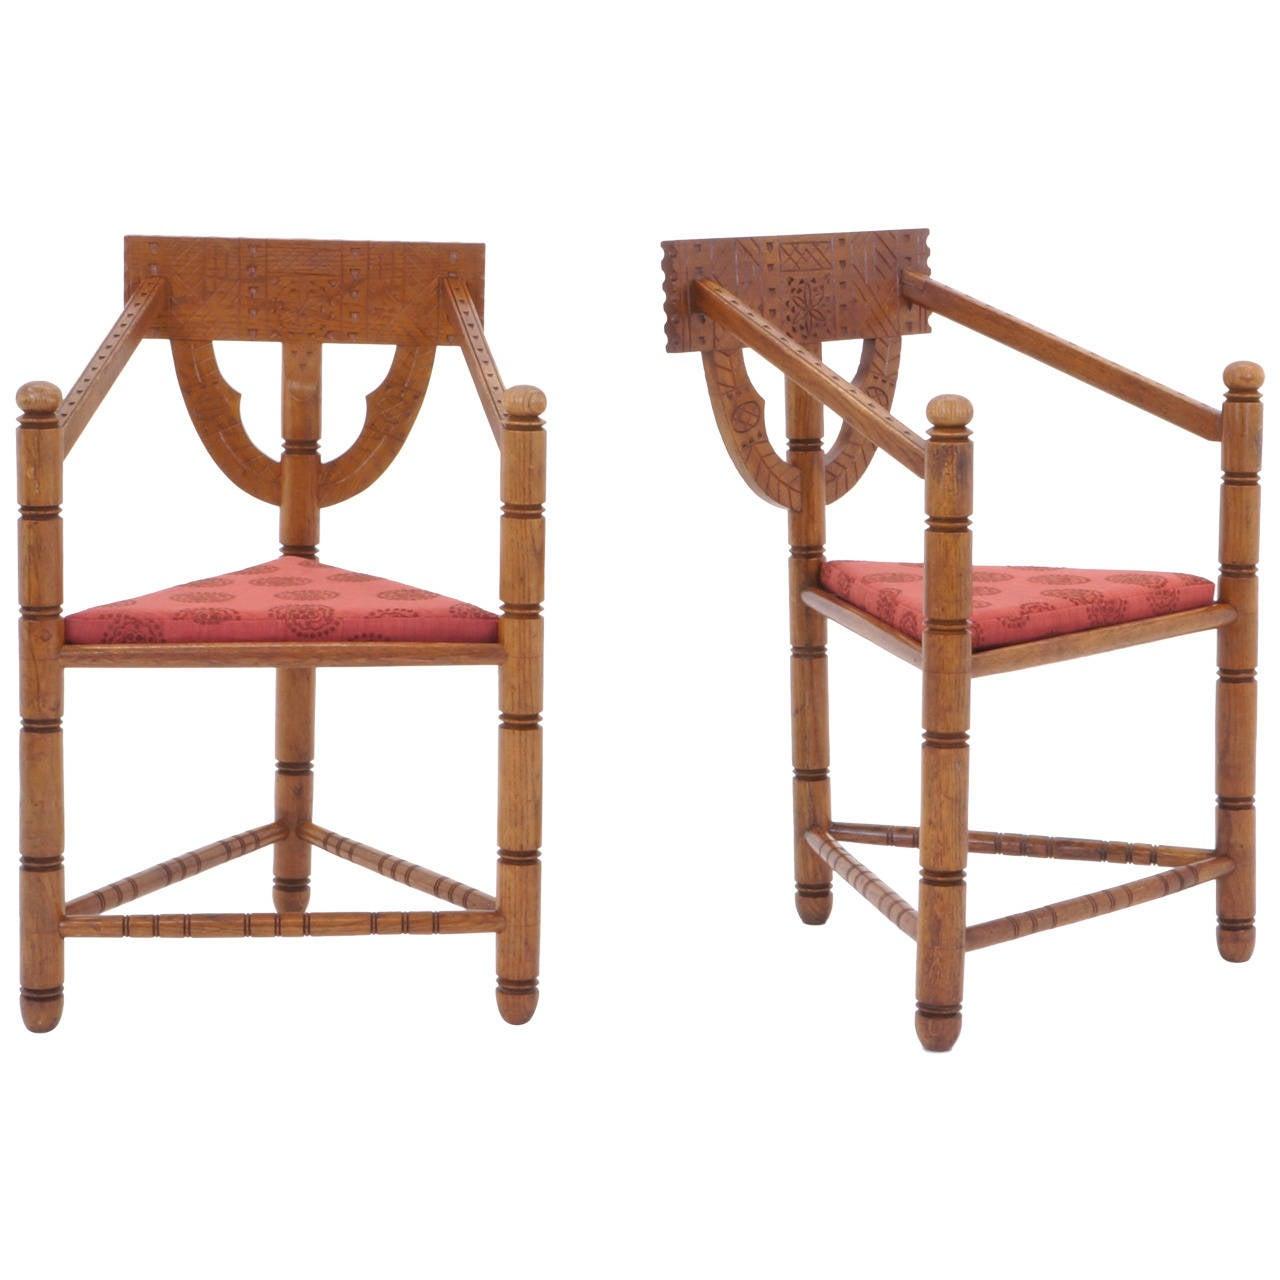 Pair of 1950s Swedish Chairs